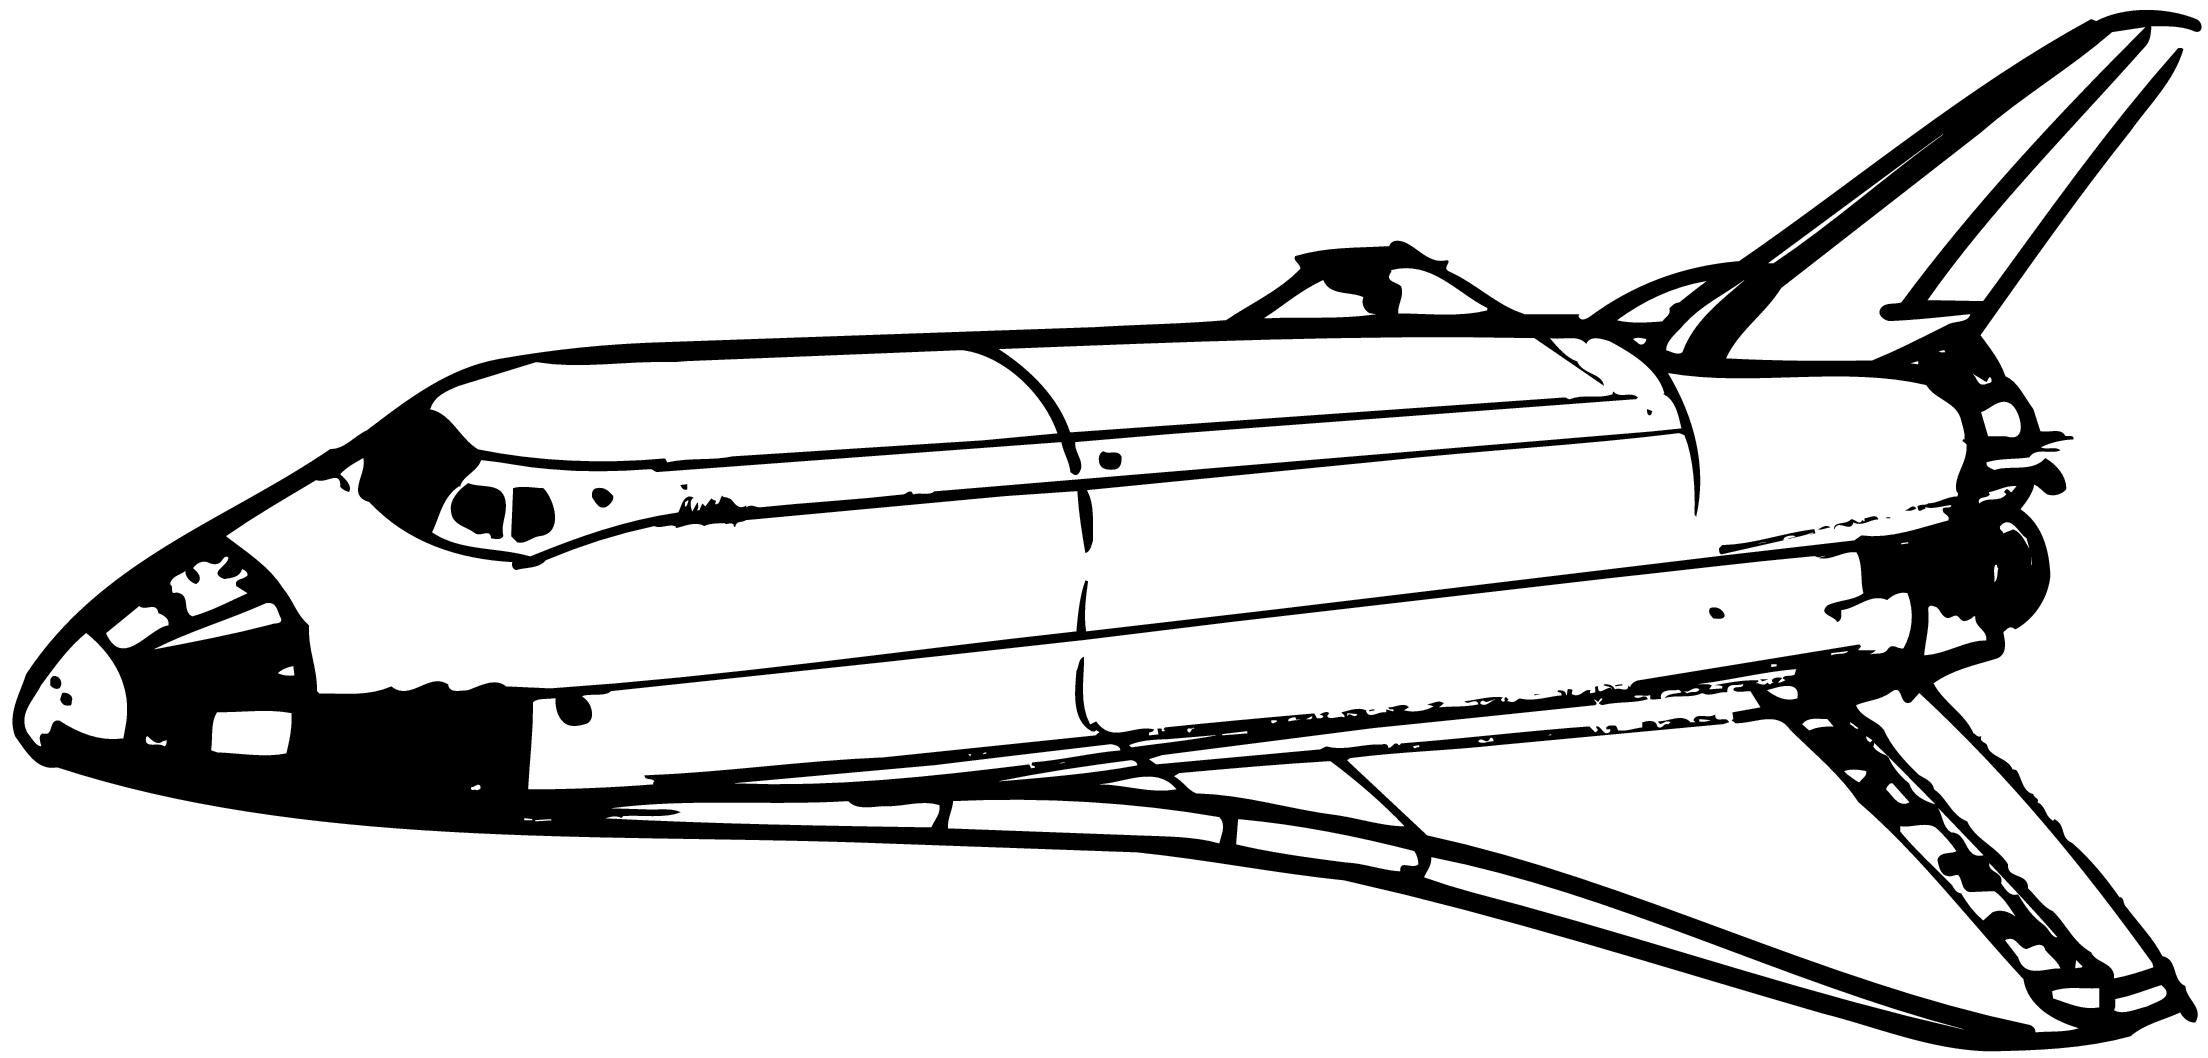 Space Shuttle Vector Cartoon Art Designs Compilation We